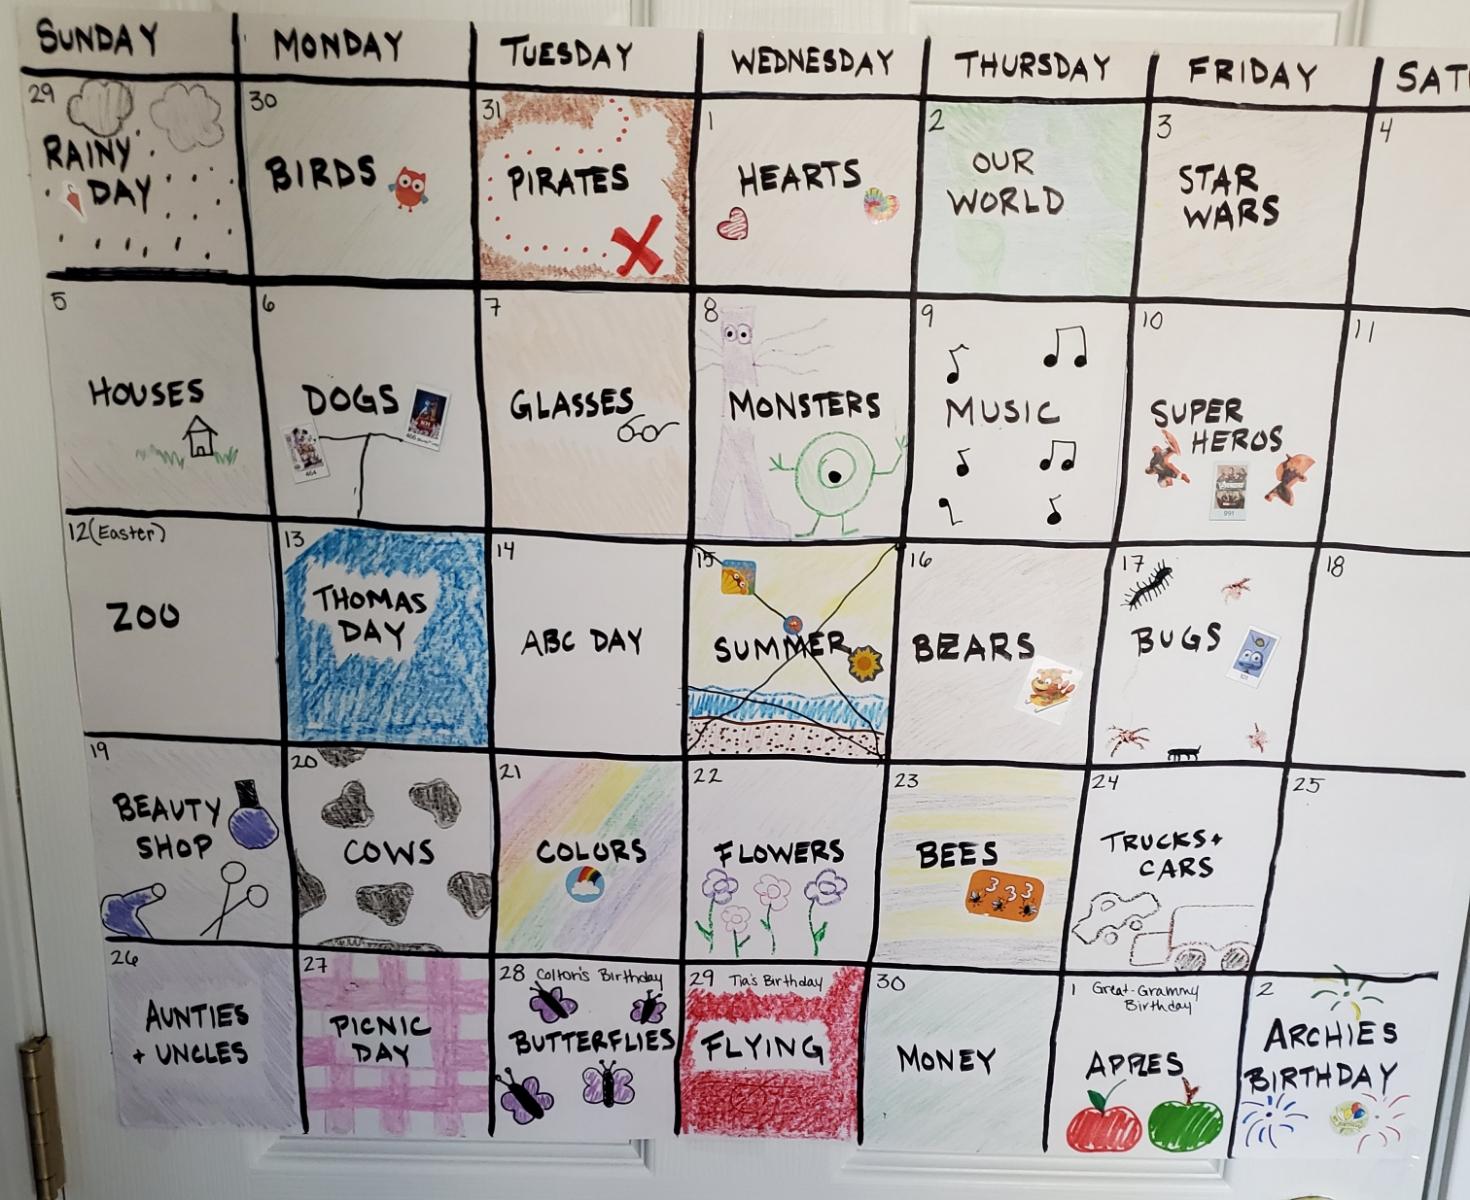 Theme Day Calendar